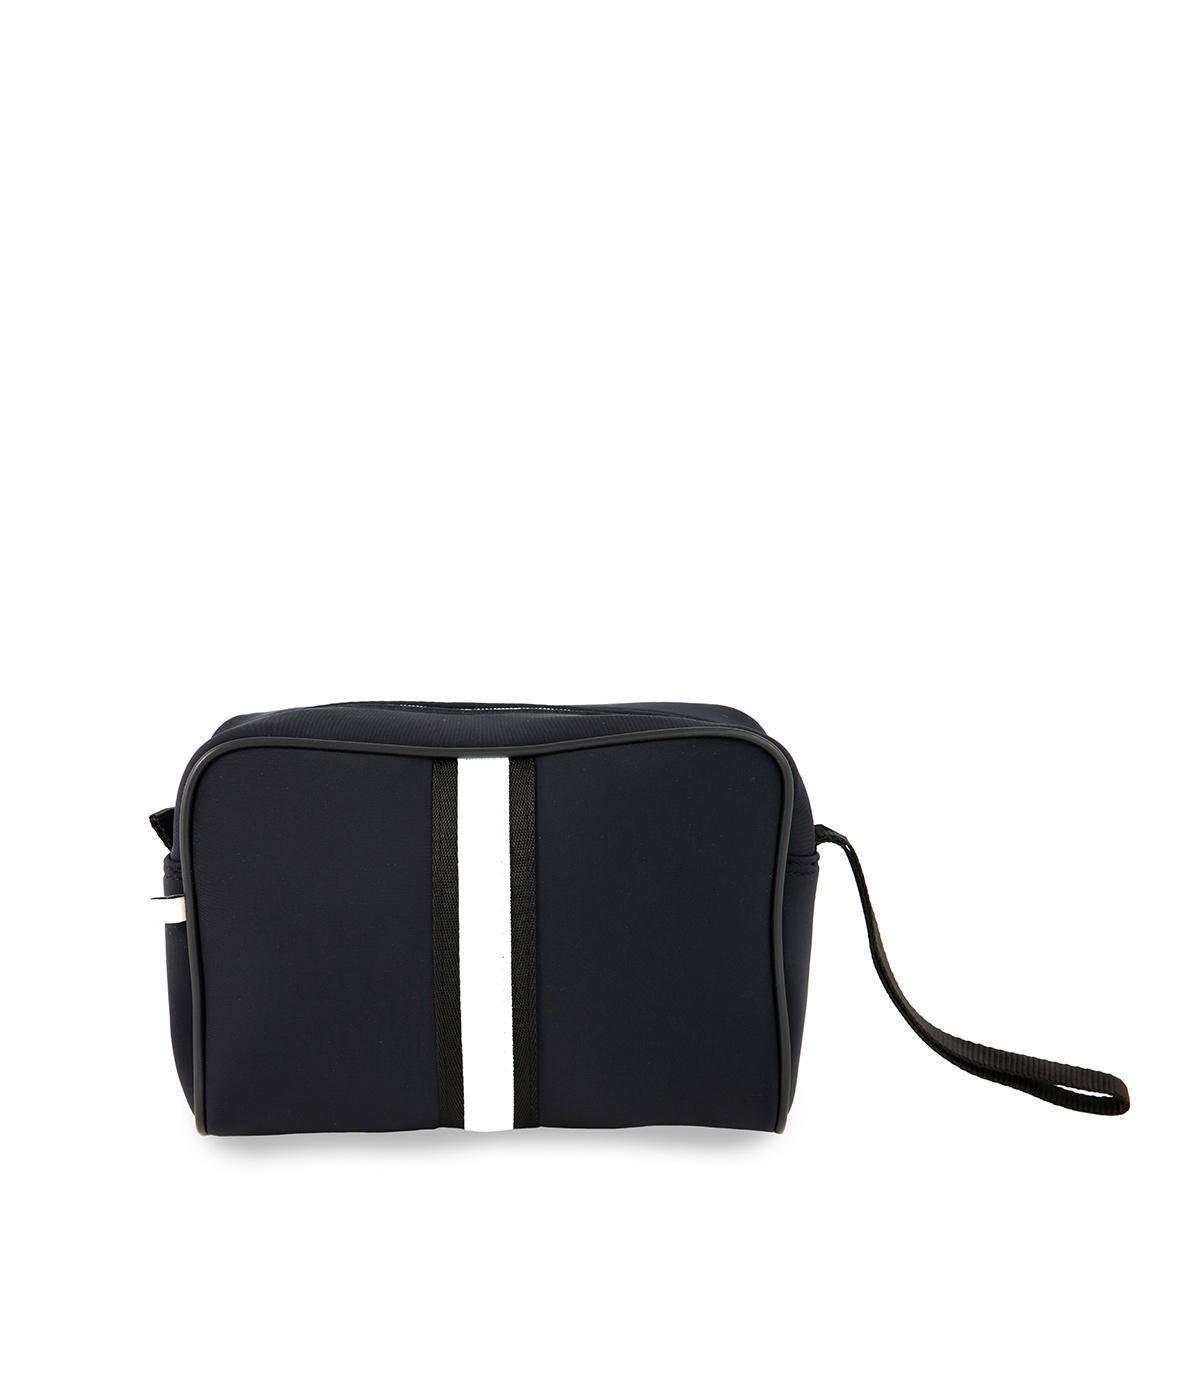 Beautybag Neoprene Impermeabile Fascia Bianca Quitto Bags – Retro